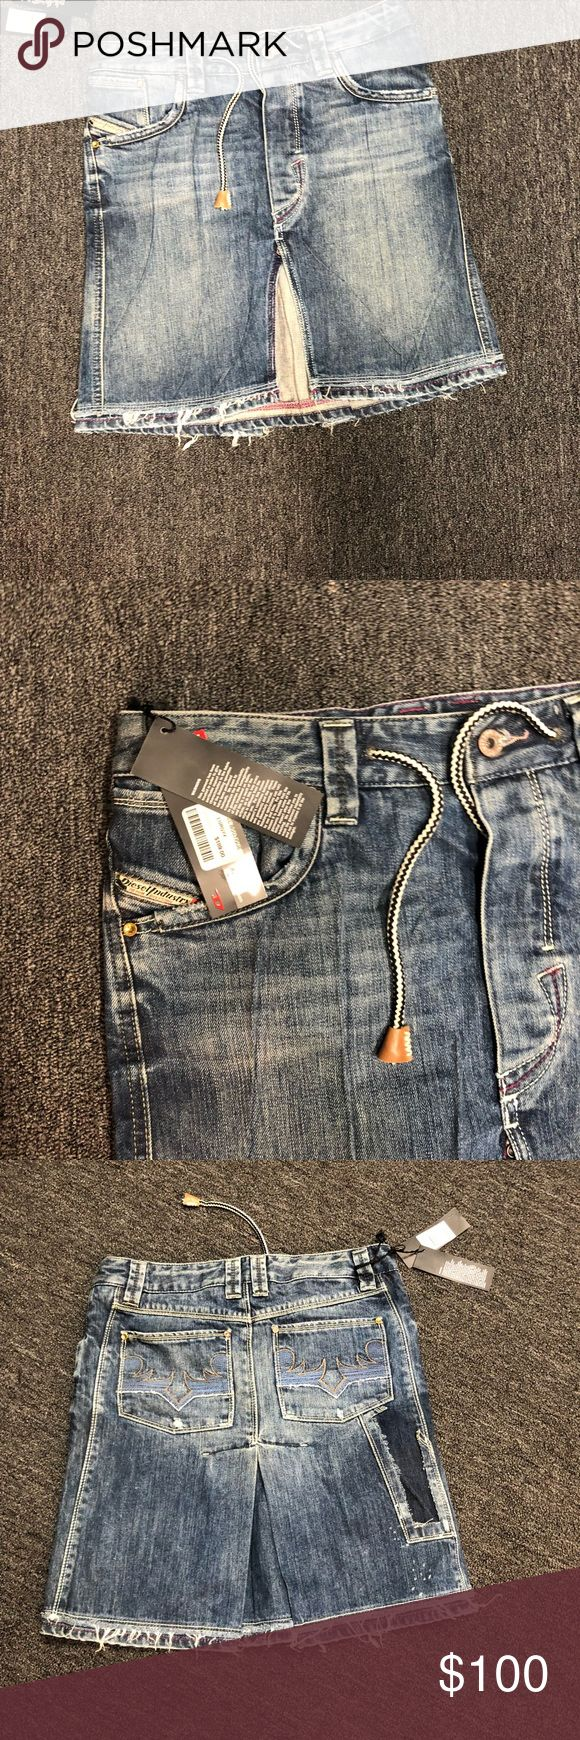 Diesel Skirt Jean skirts. Size 28 Diesel Skirts A-Line or Full